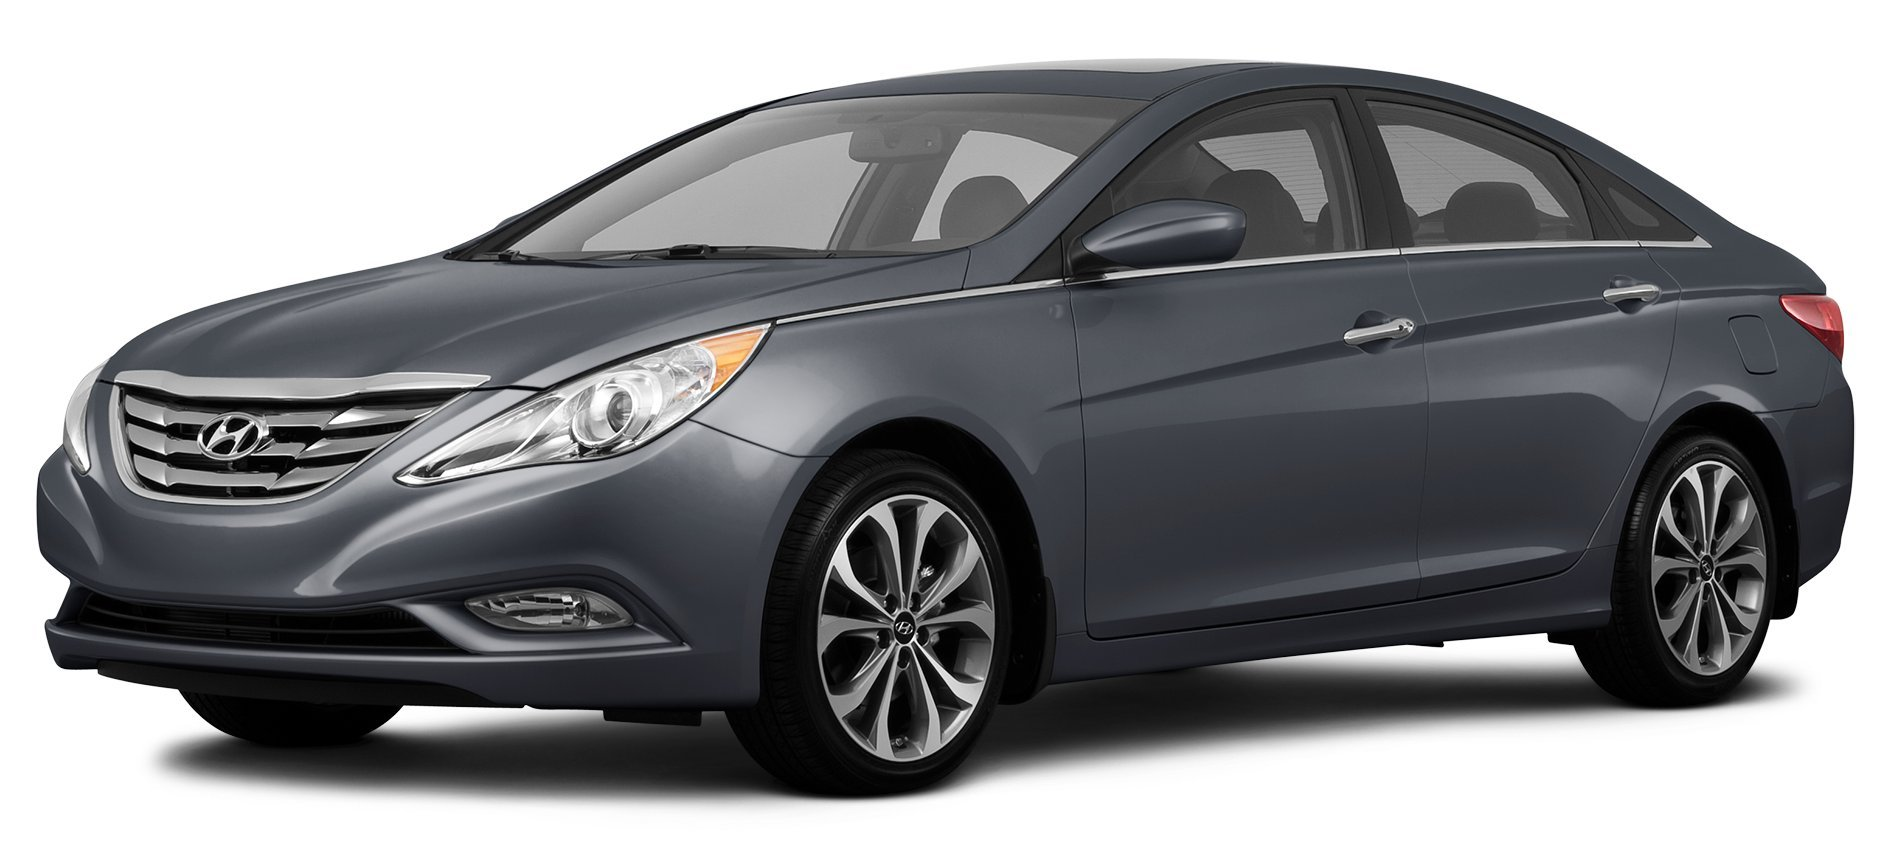 ... 2013 Hyundai Sonata SE, 4-Door Sedan 2.4L Automatic Transmission ...